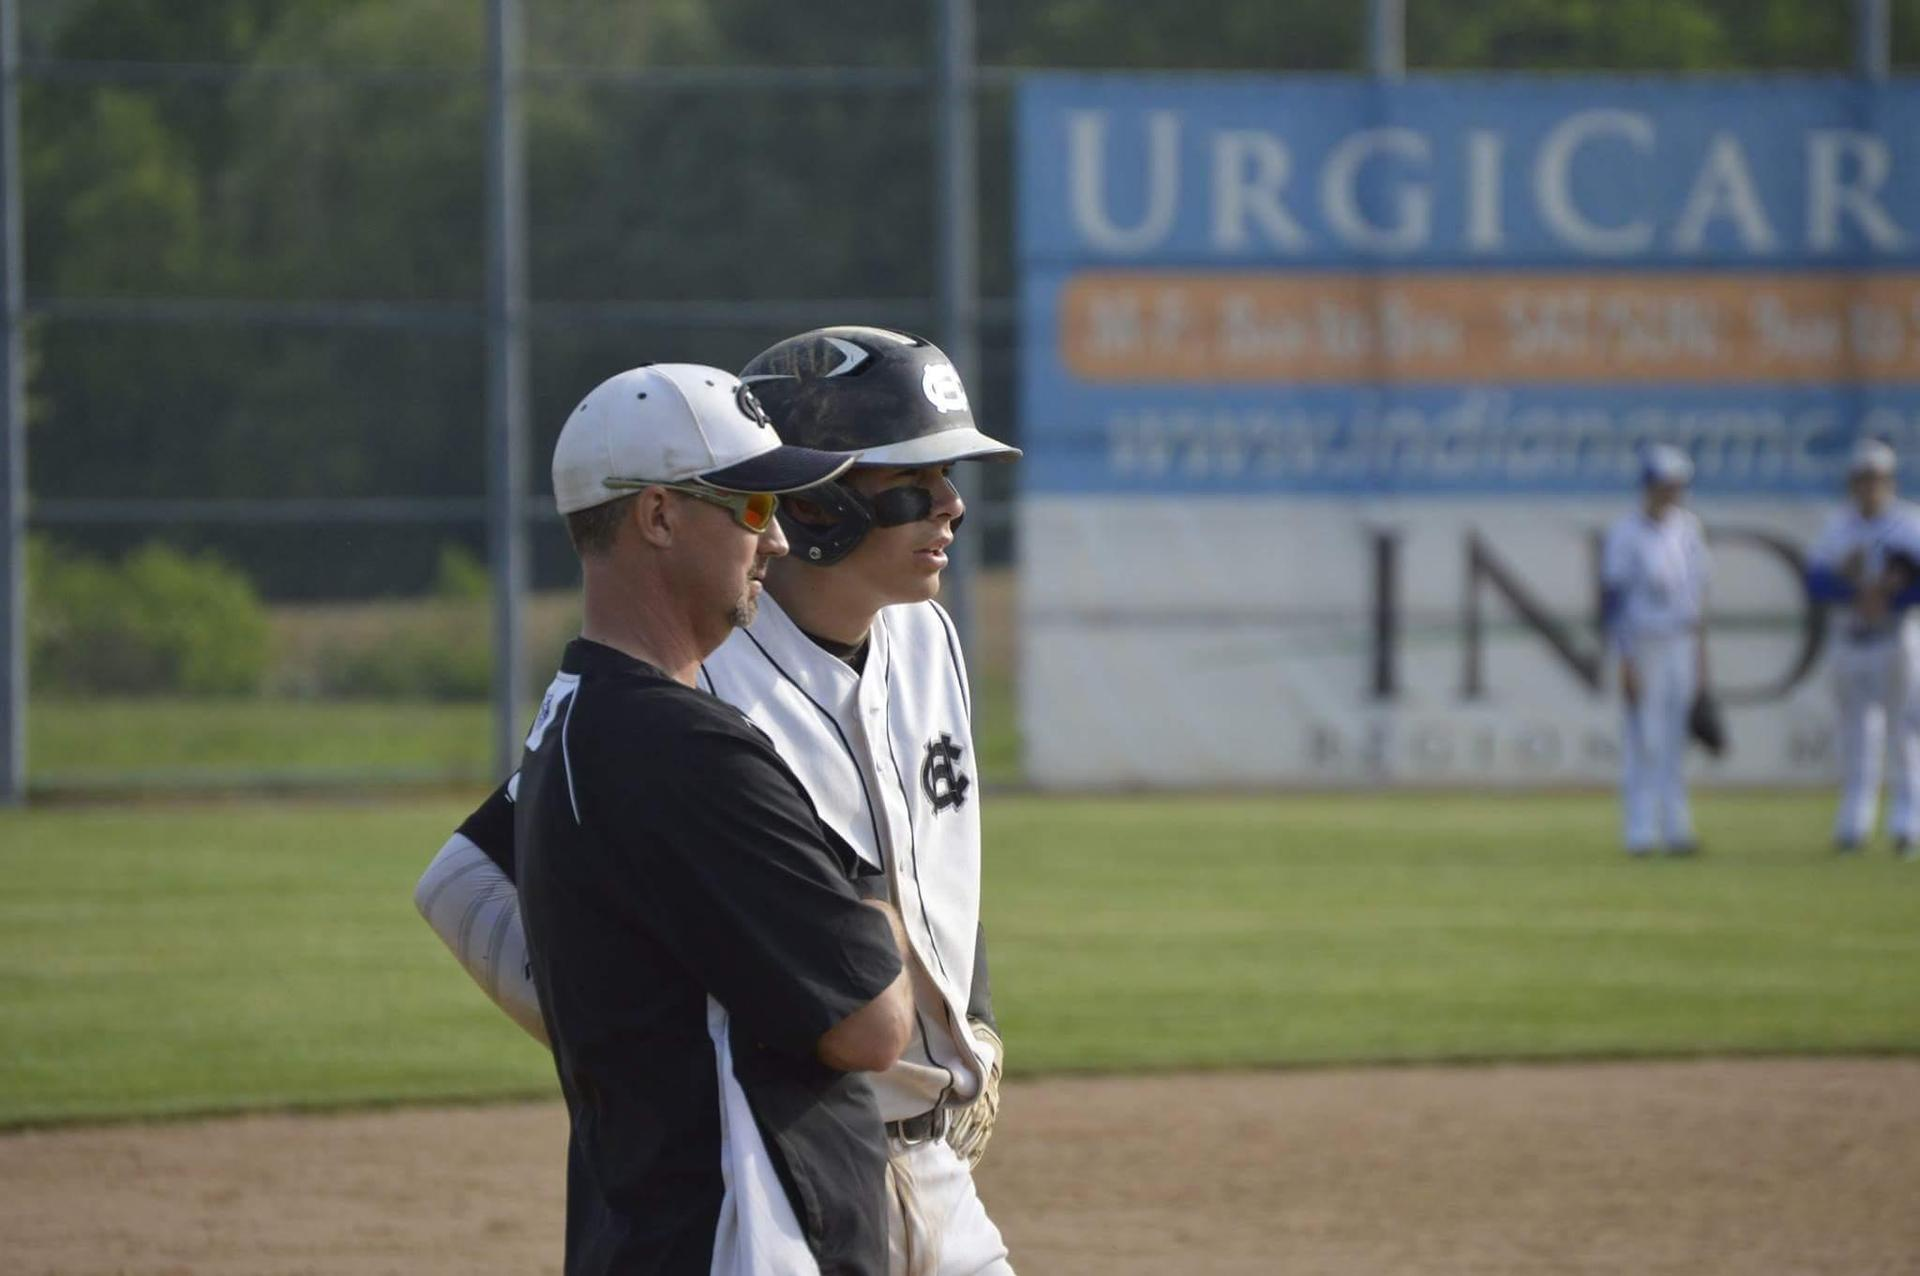 Coach Bauer